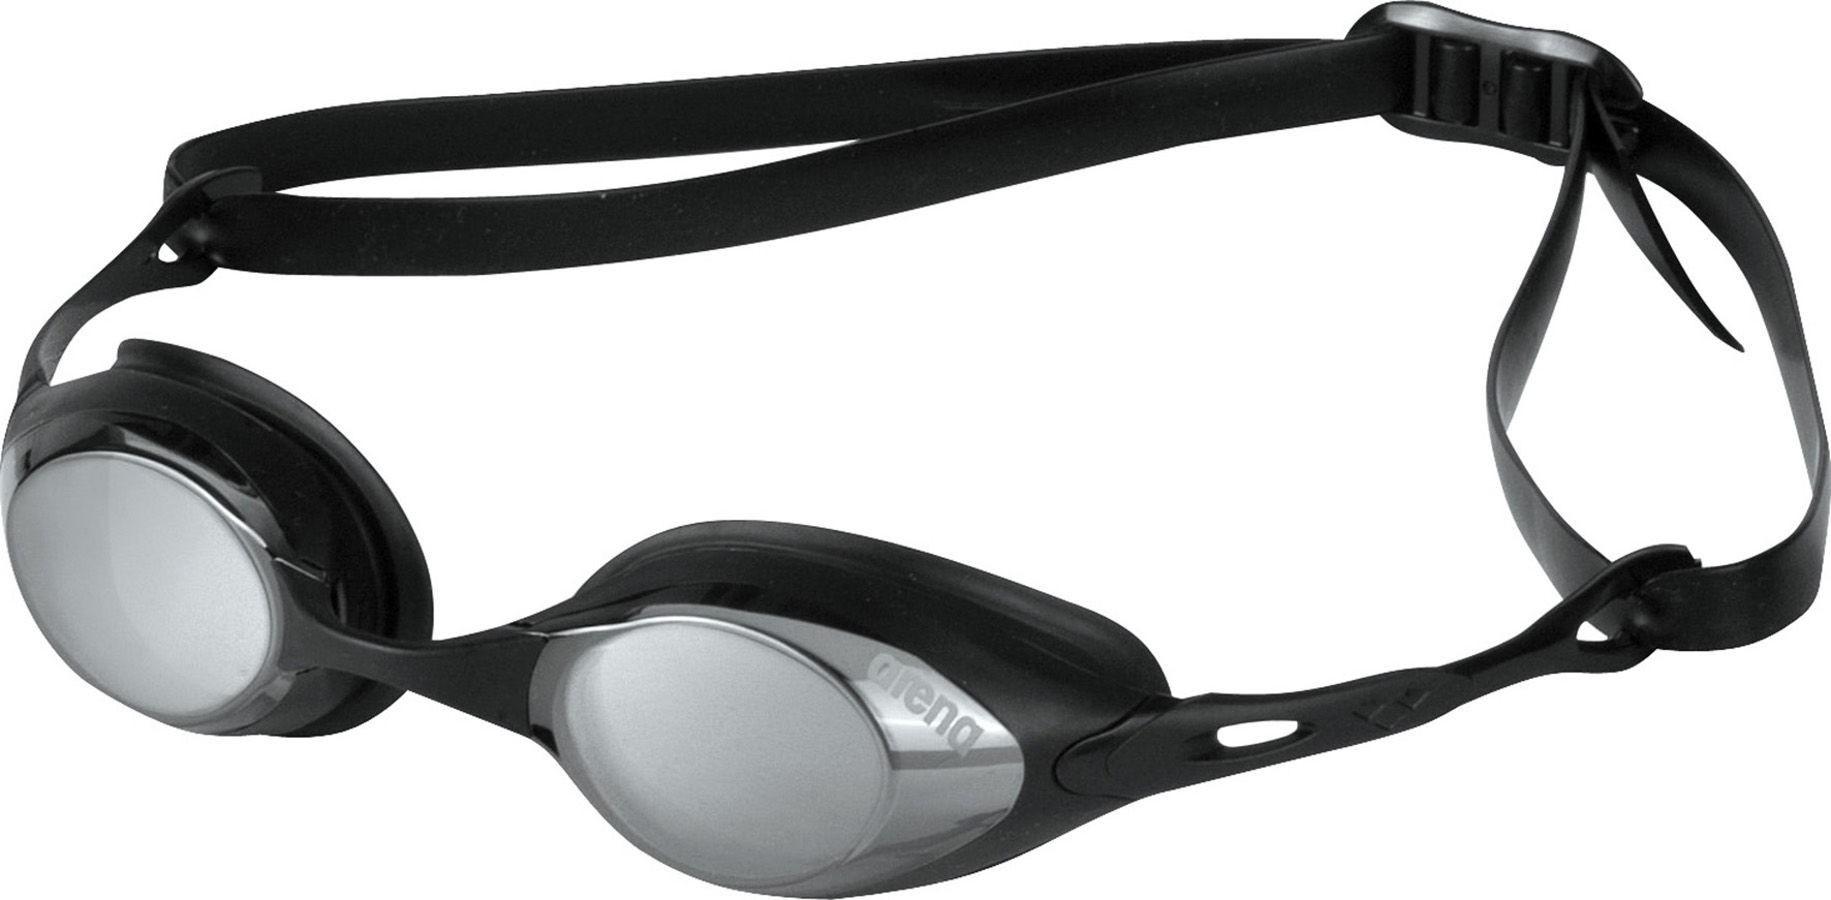 Arena wedstrijd zwembril Cobra Mirror Smoke/Silver/ Black